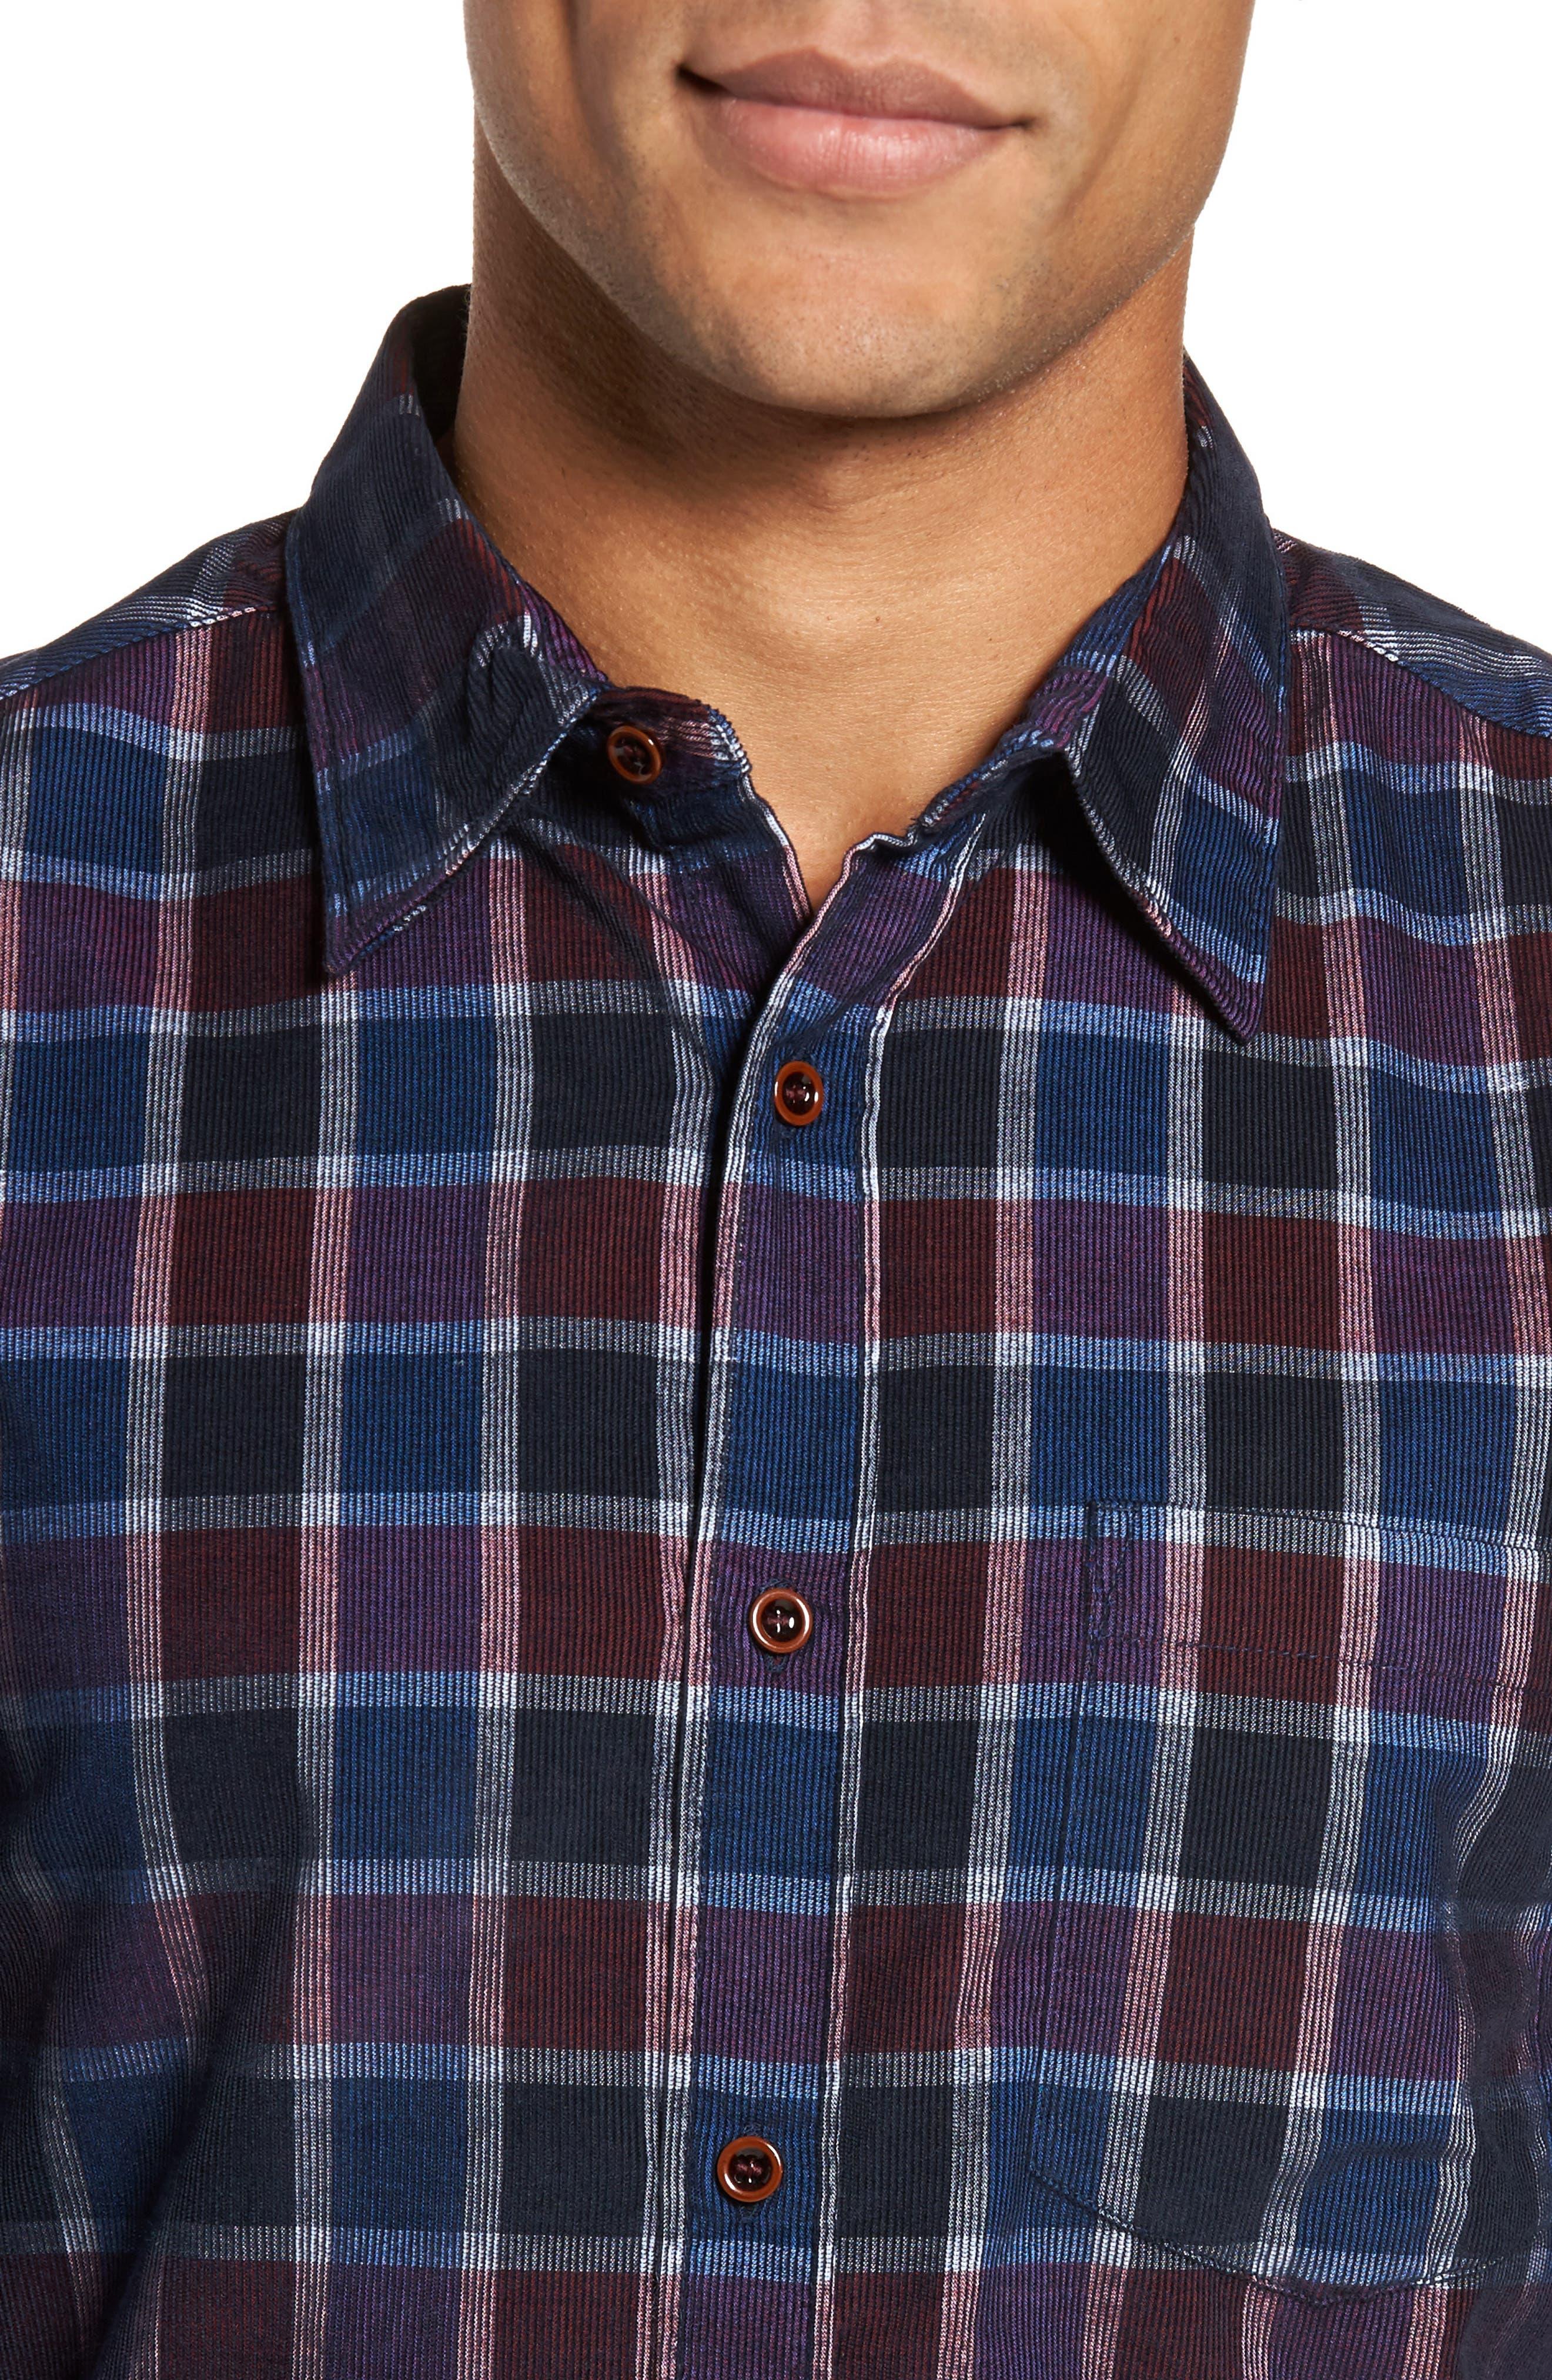 Plaid Corduroy Sport Shirt,                             Alternate thumbnail 8, color,